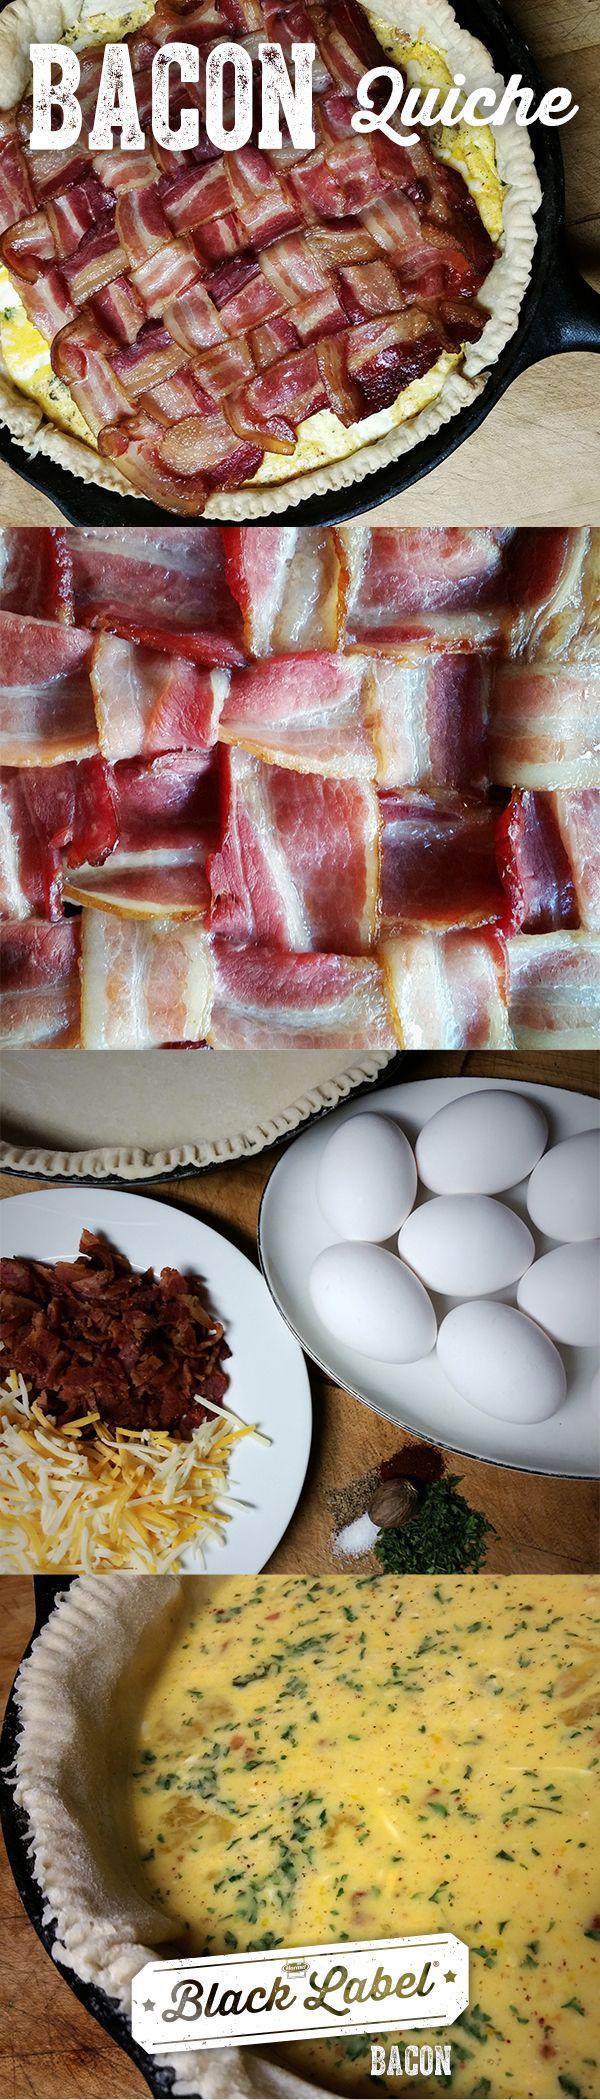 Bacon Quiche | Always add bacon to your quiche. Then add more bacon to your bacon quiche. | Best breakfast recipe. | Black Label® Bacon